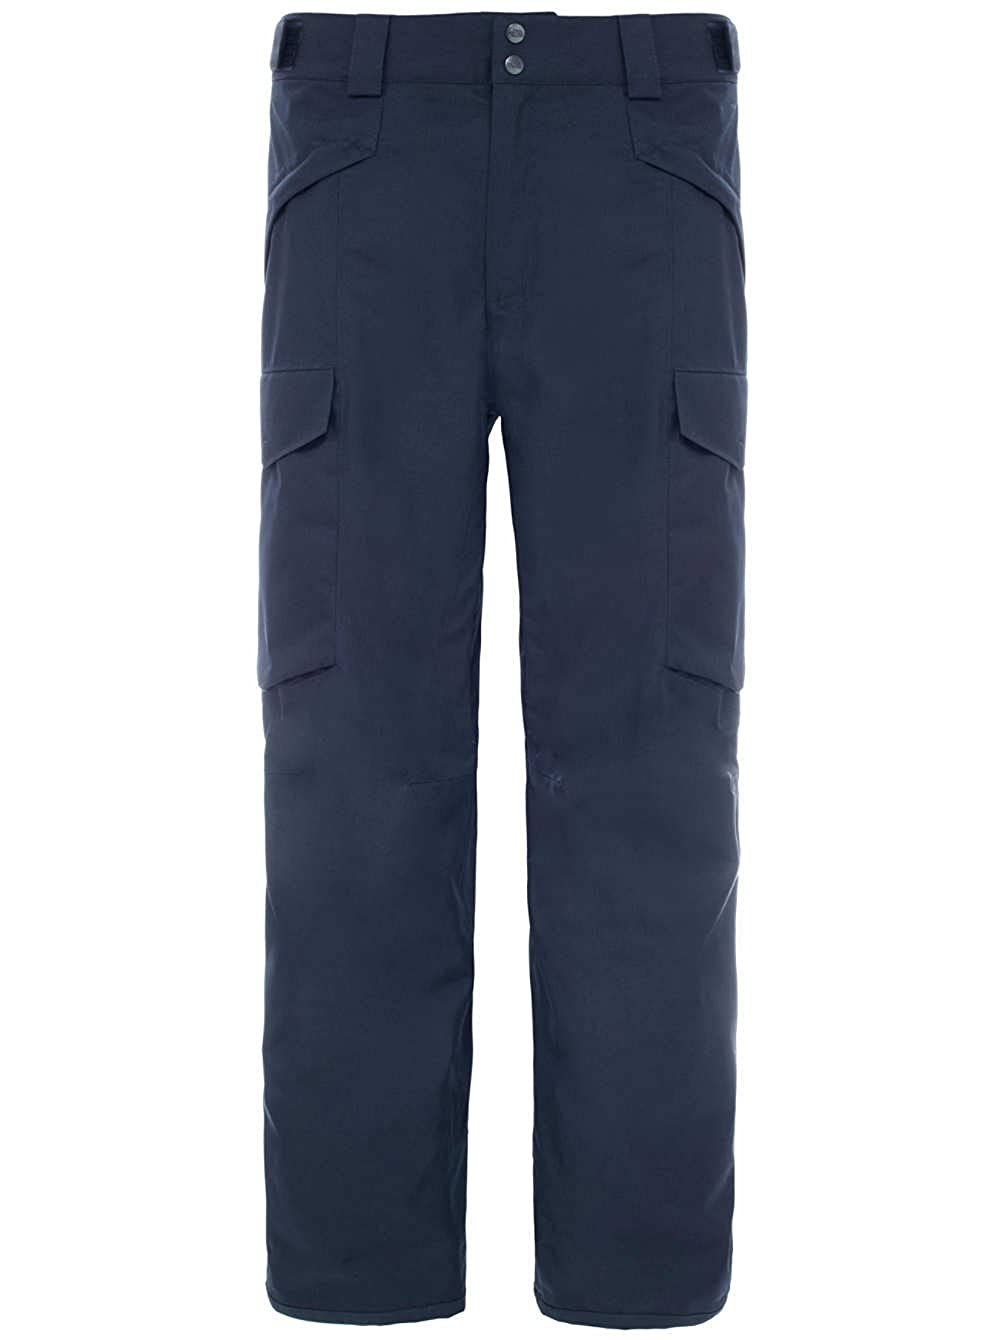 4cb982a33 Amazon.com: The North Face Men's Gatekeeper Ski Pant Navy: Clothing